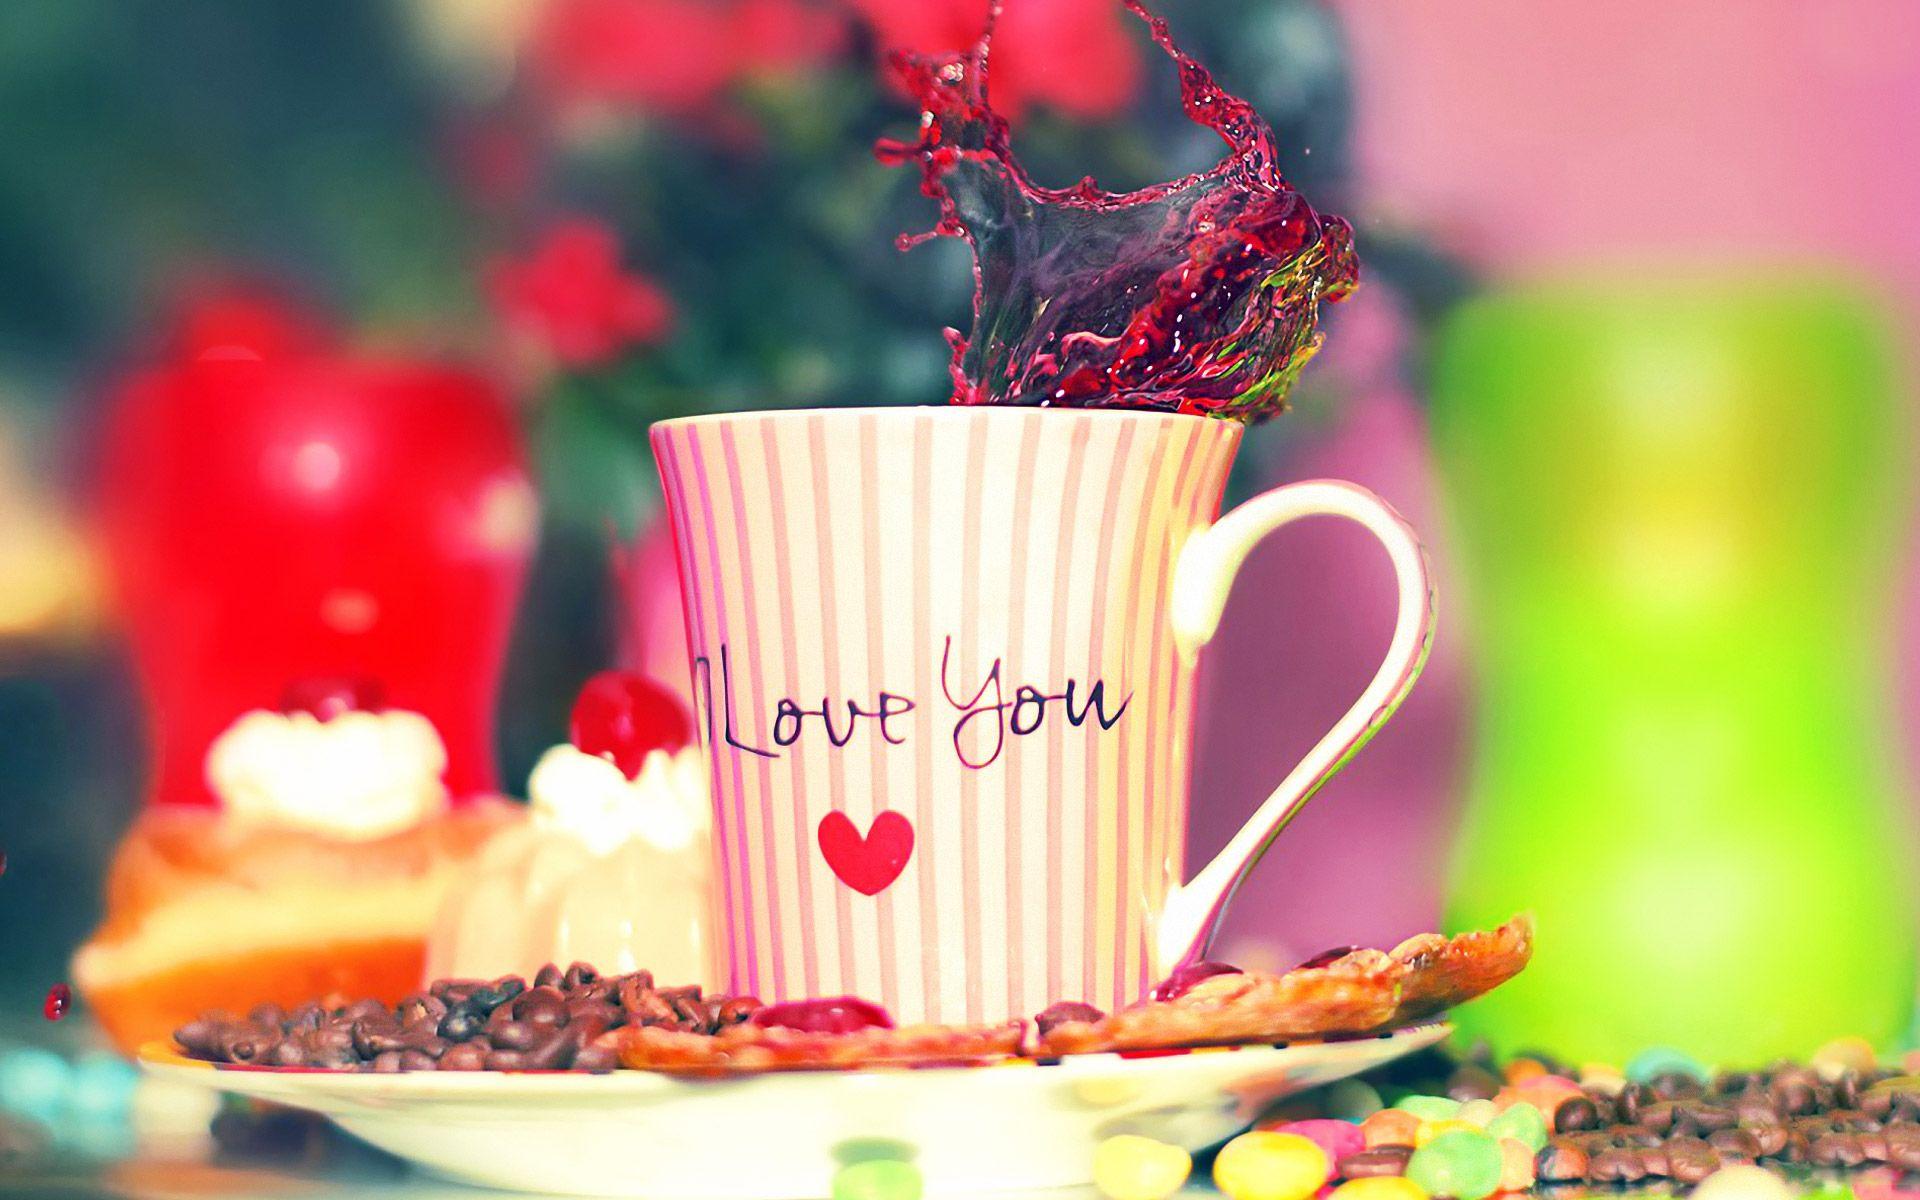 Hd wallpaper romantic - Love Romantic Hd Wallpaper Love Romance Rose Hearts Quotes Wallpapers